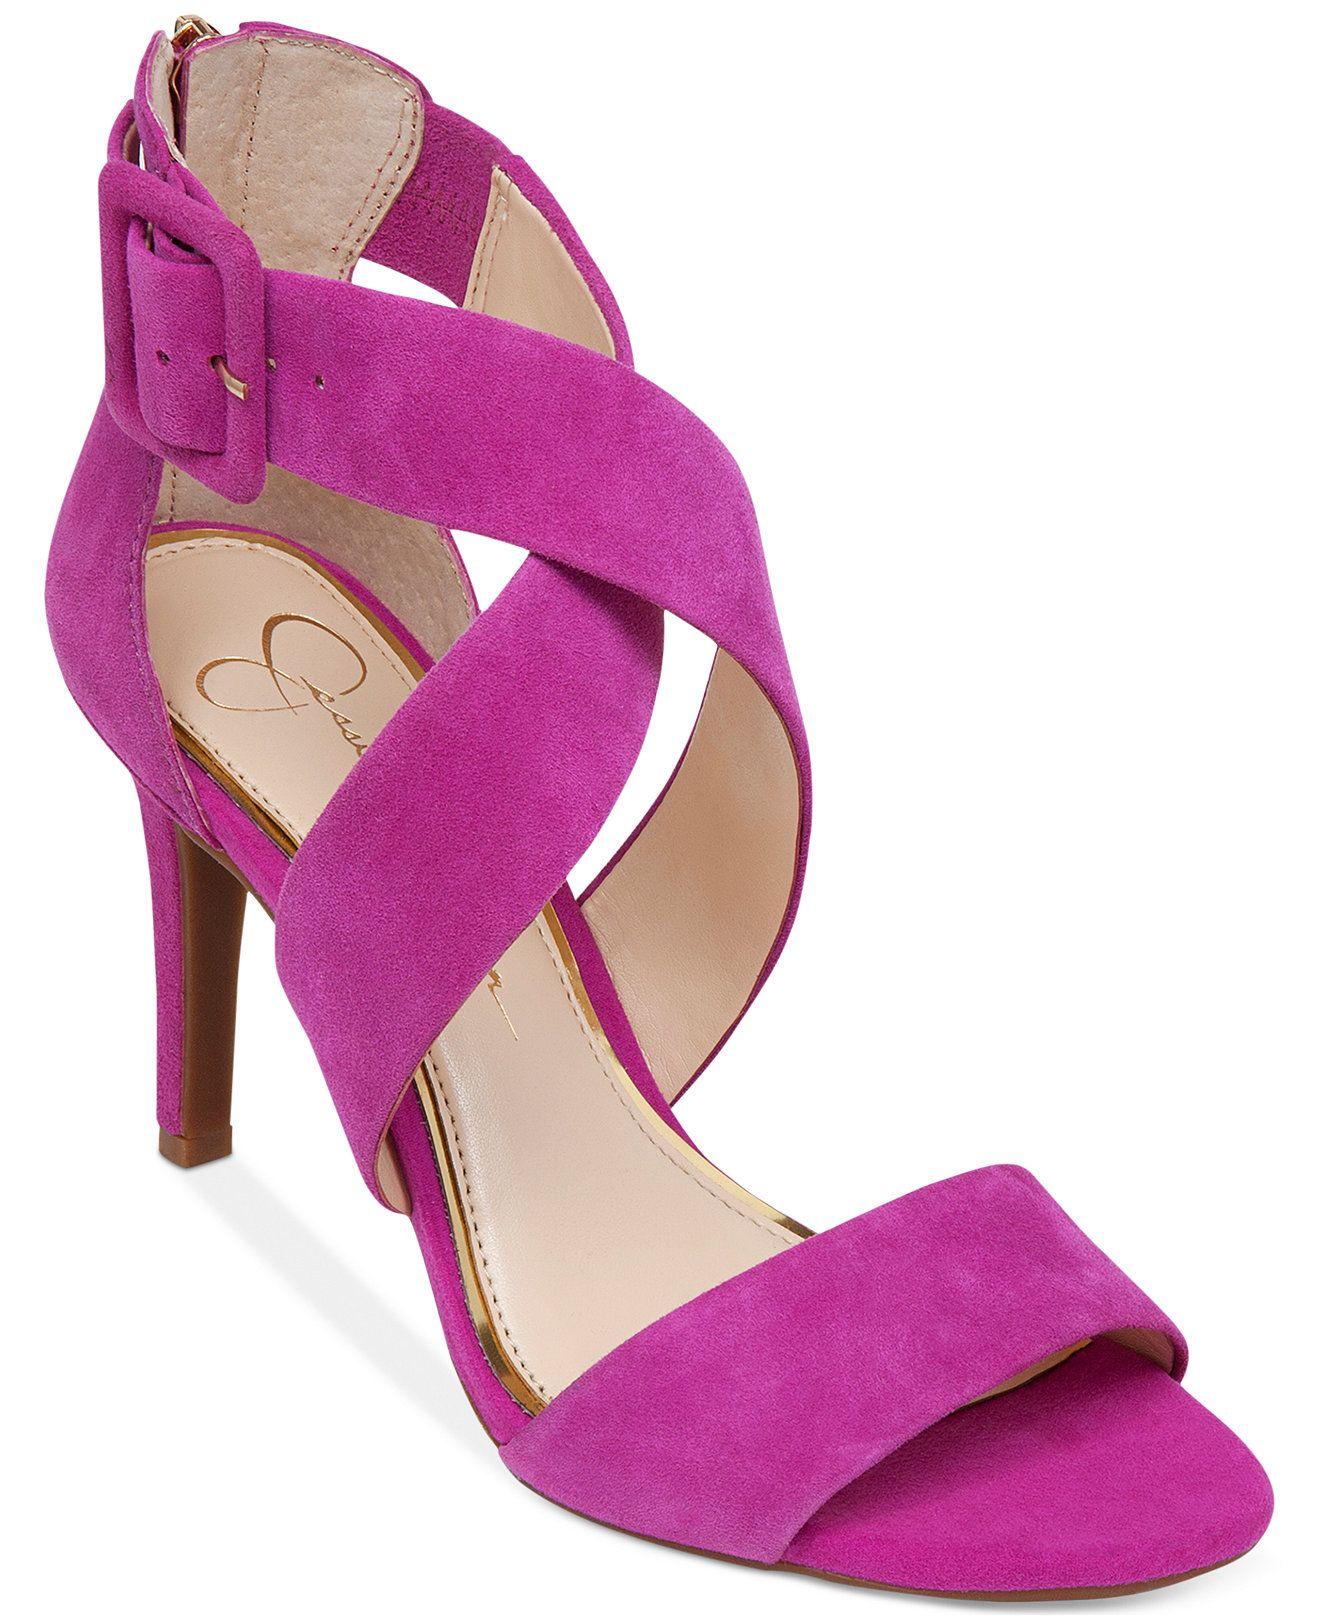 Jessica Simpson Liddy Cross Strap Sandals - Sandals - Shoes - Macy\'s ...